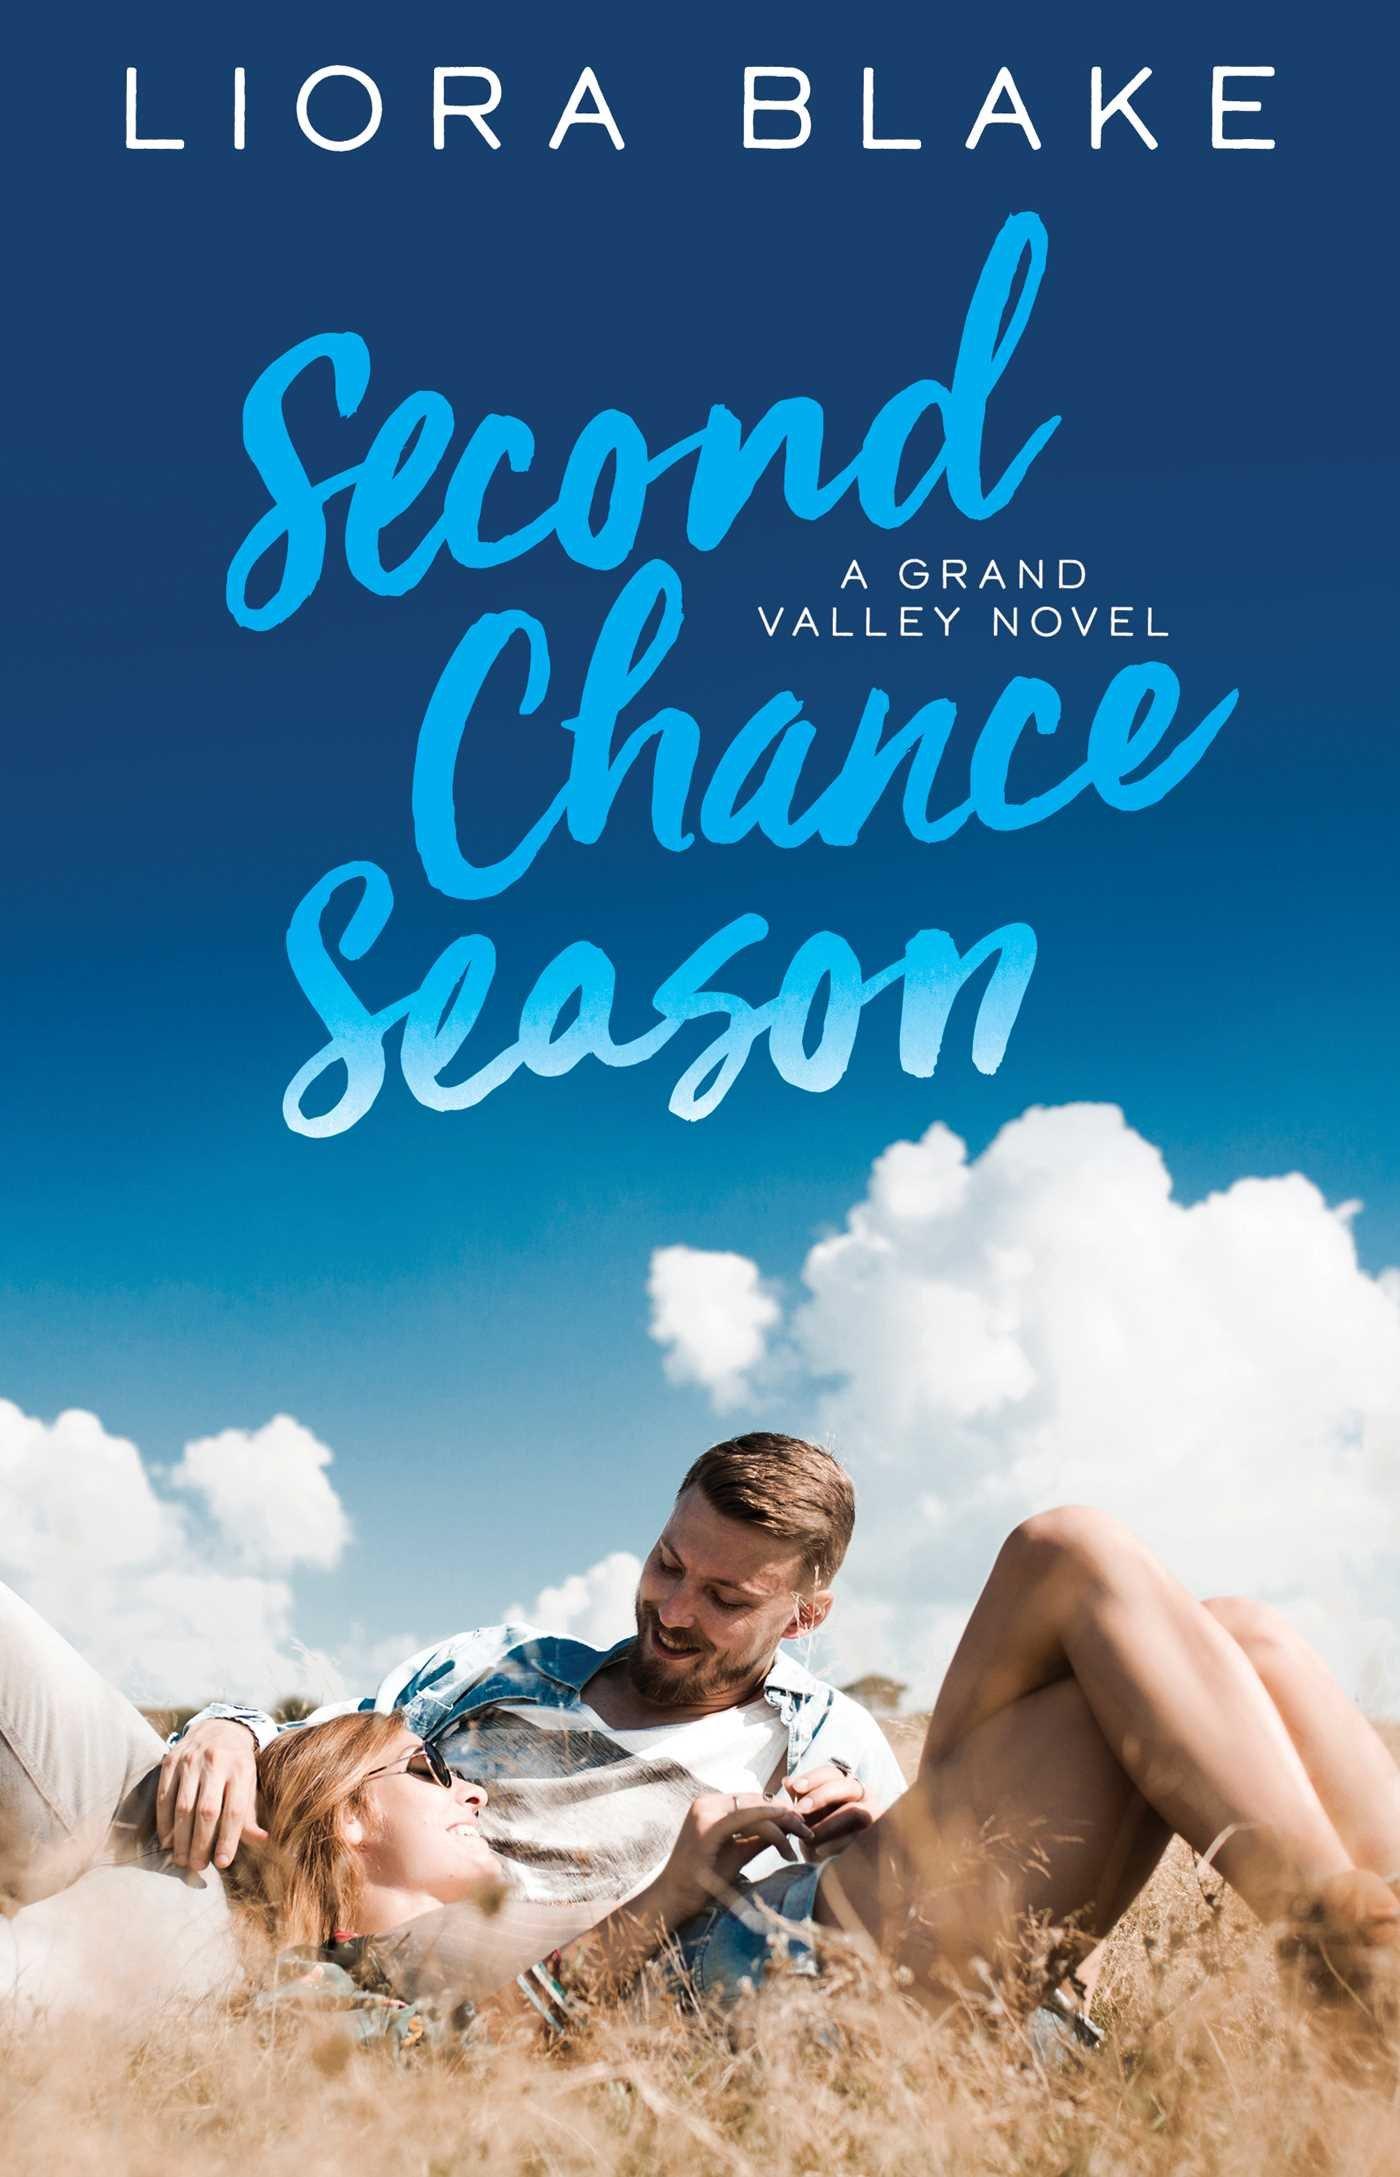 Second Chance Season (The Grand Valley Series): Liora Blake ...